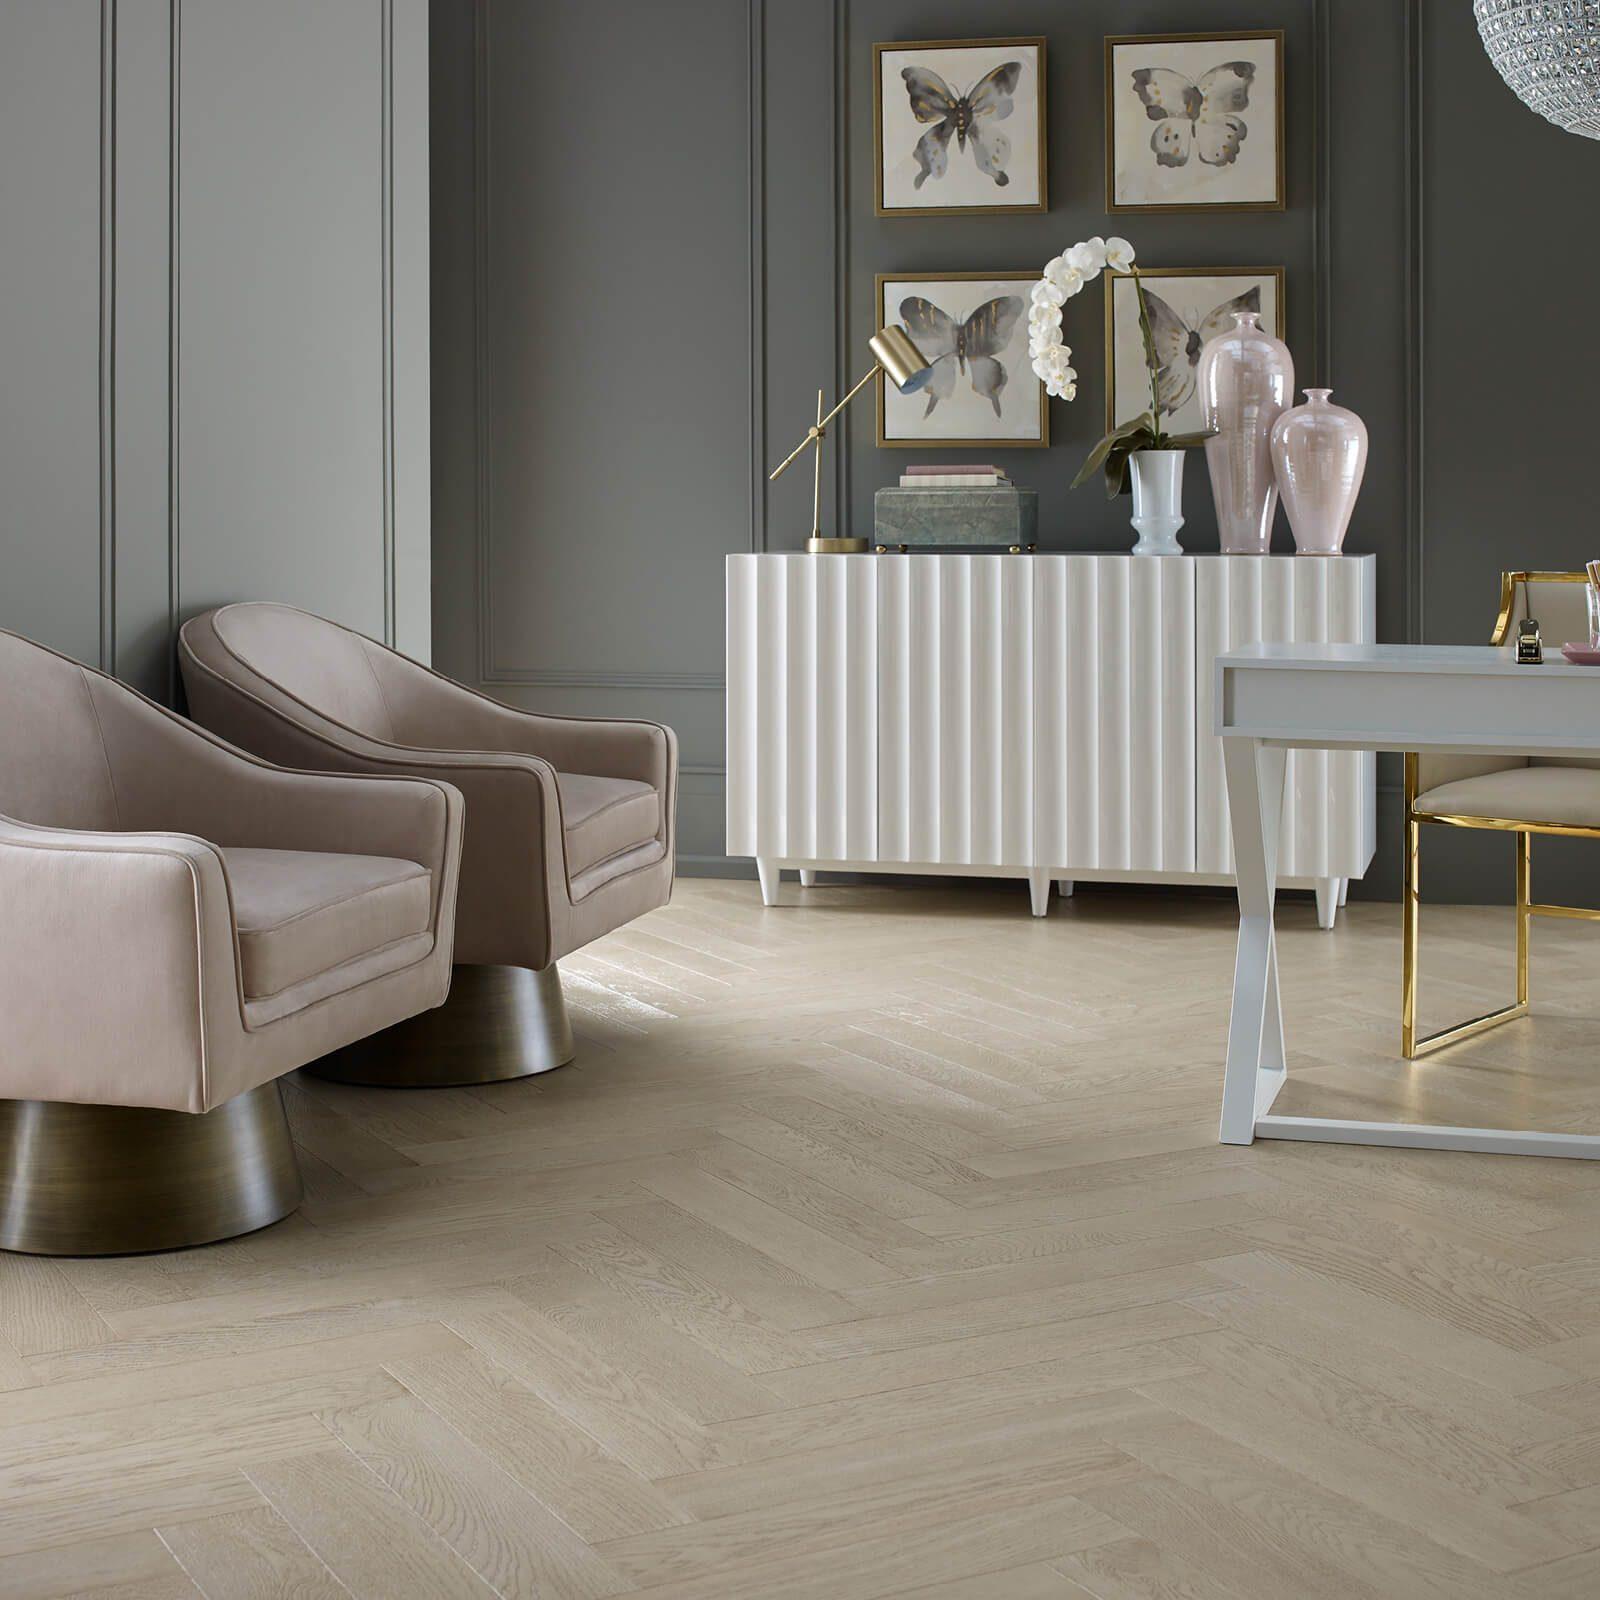 Commercial flooring | Price Flooring